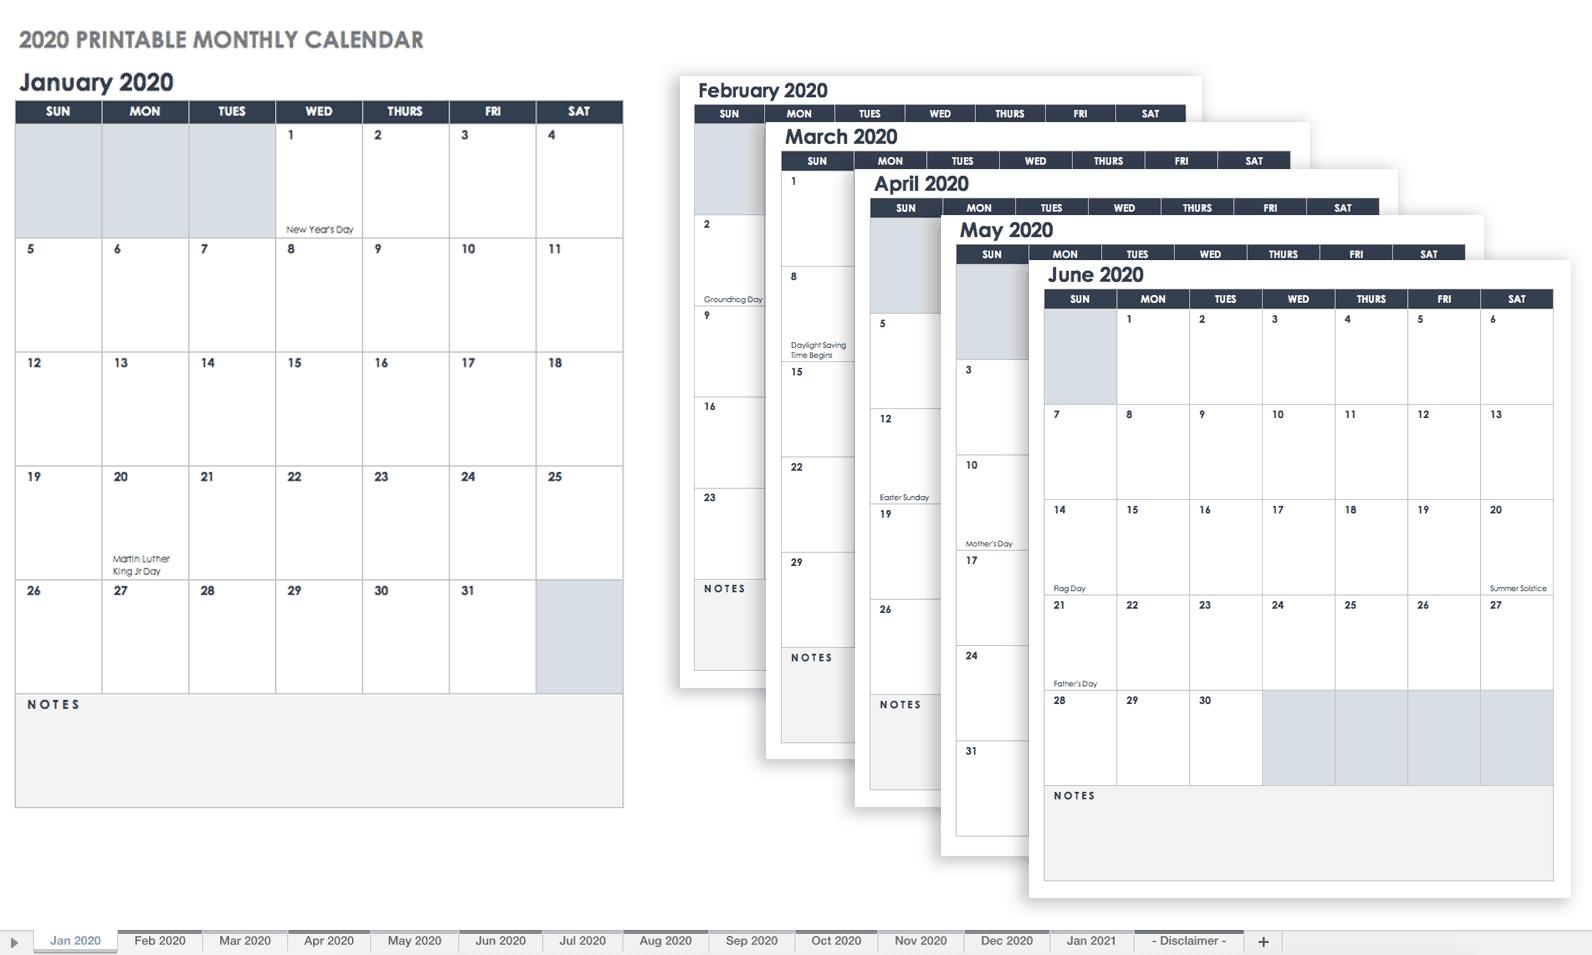 Free Blank Calendar Templates - Smartsheet-Blank Calendar Grid Printable